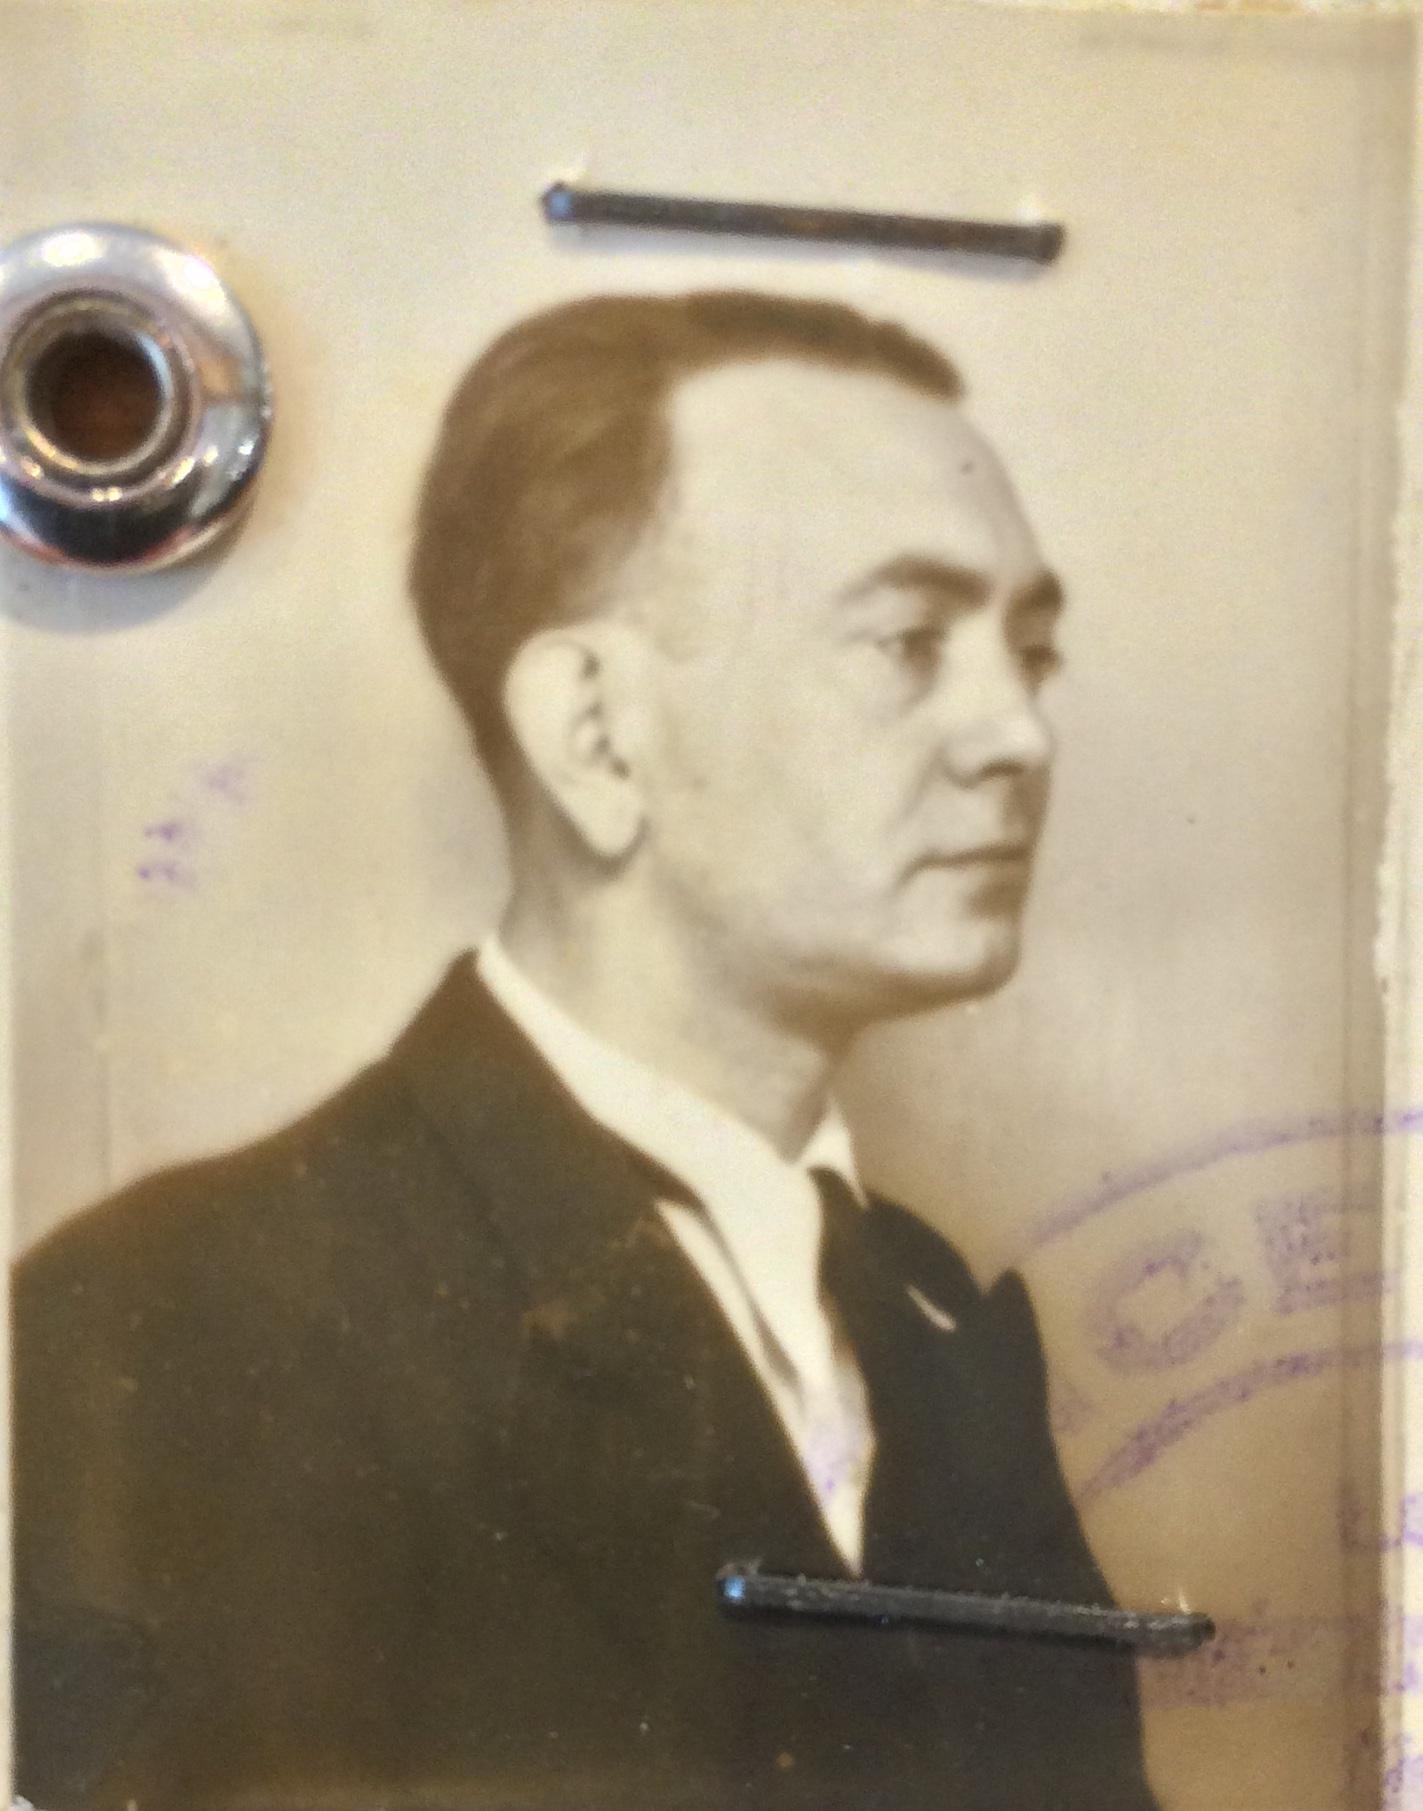 Mejlach HONIKSFELD 1938 [ADML 120W61]